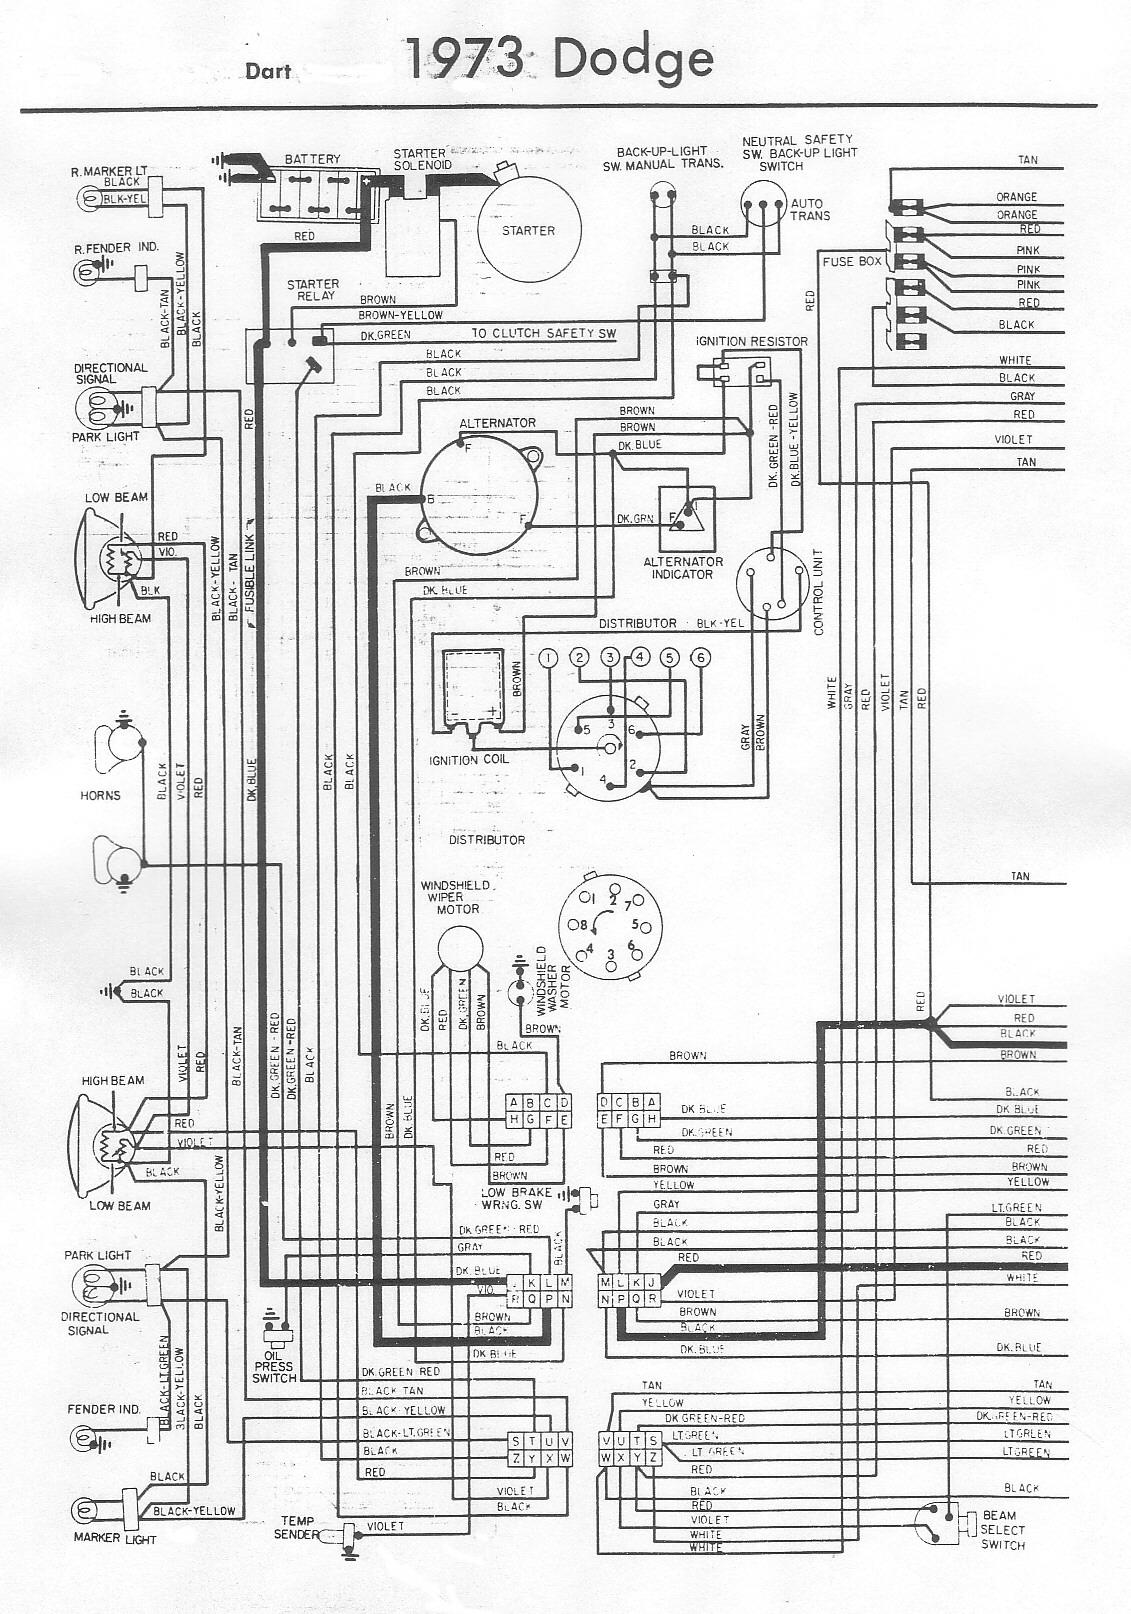 small resolution of dodge dart wiring diagram wiring diagram advance 1969 dodge dart wiring diagram 1969 dodge wiring diagram